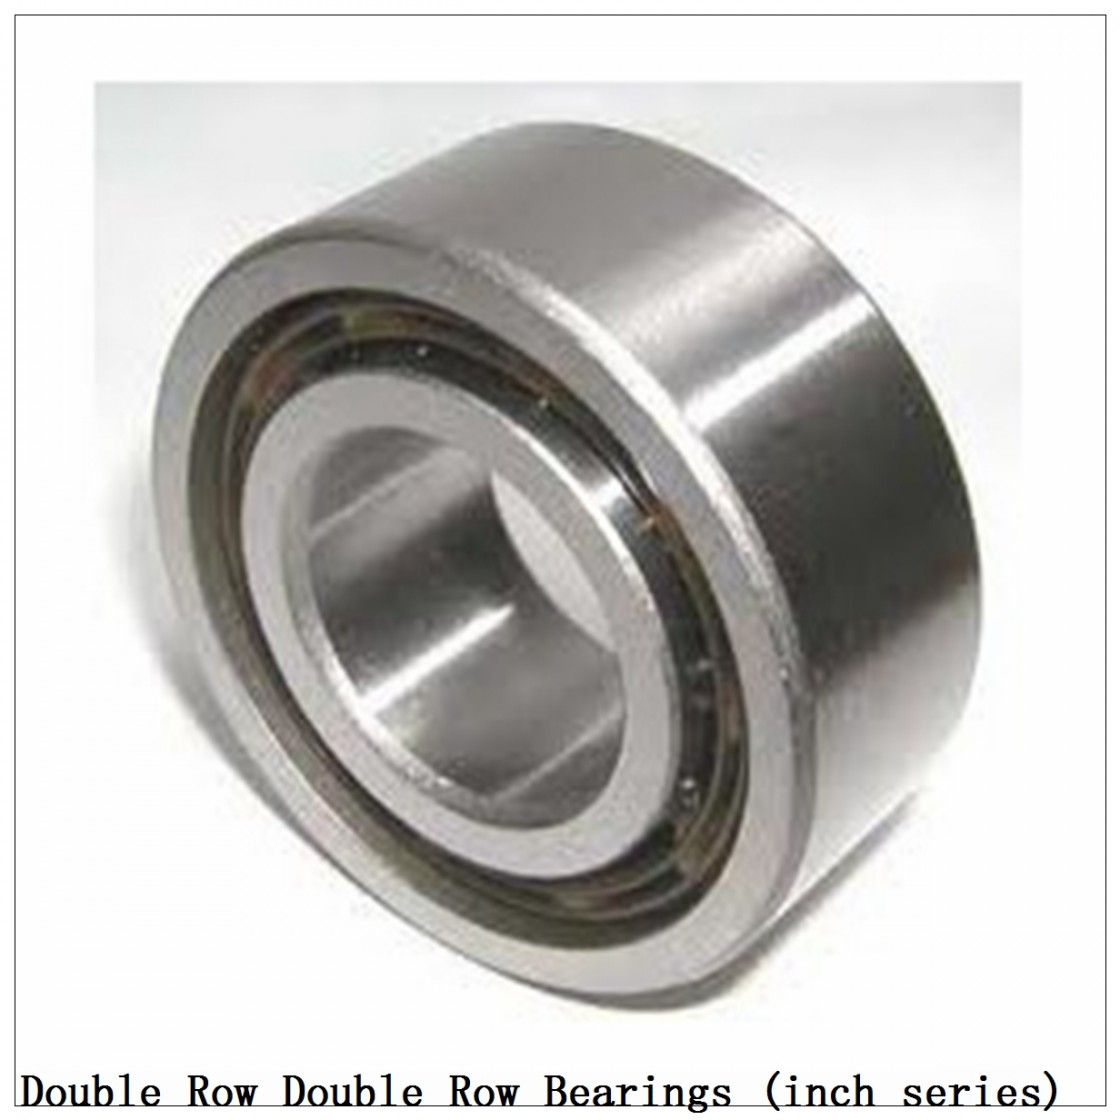 48393D/48320 Double row double row bearings (inch series)